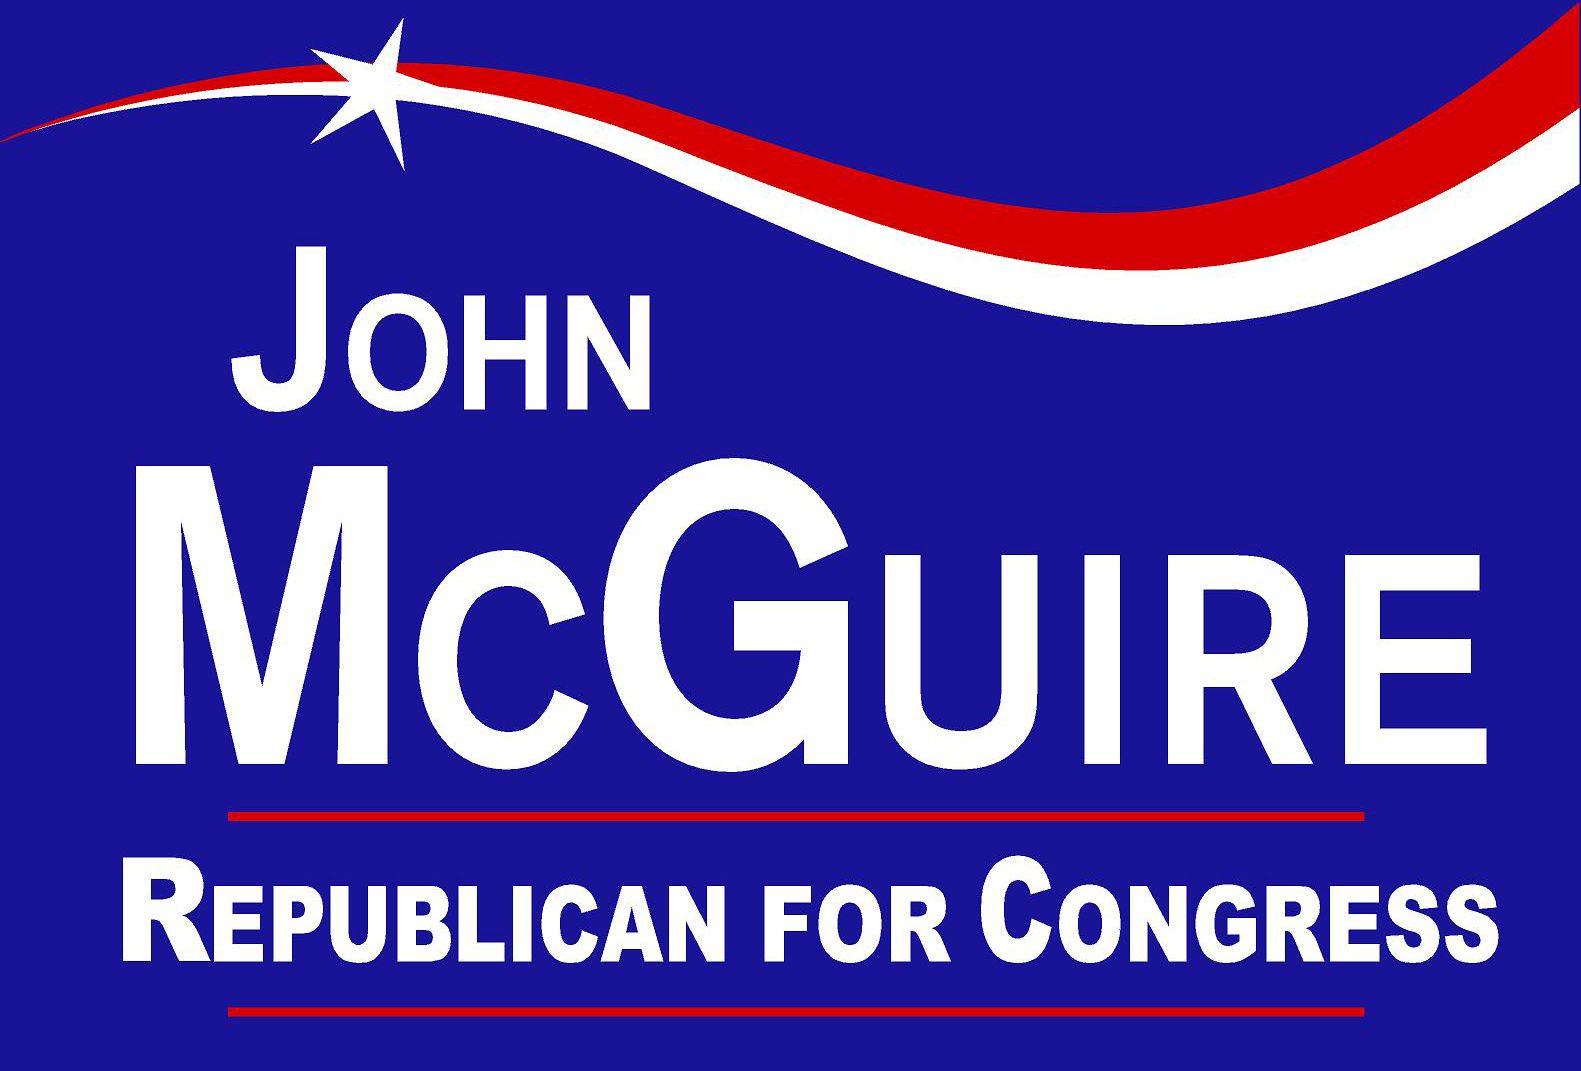 Mcguire congress logo